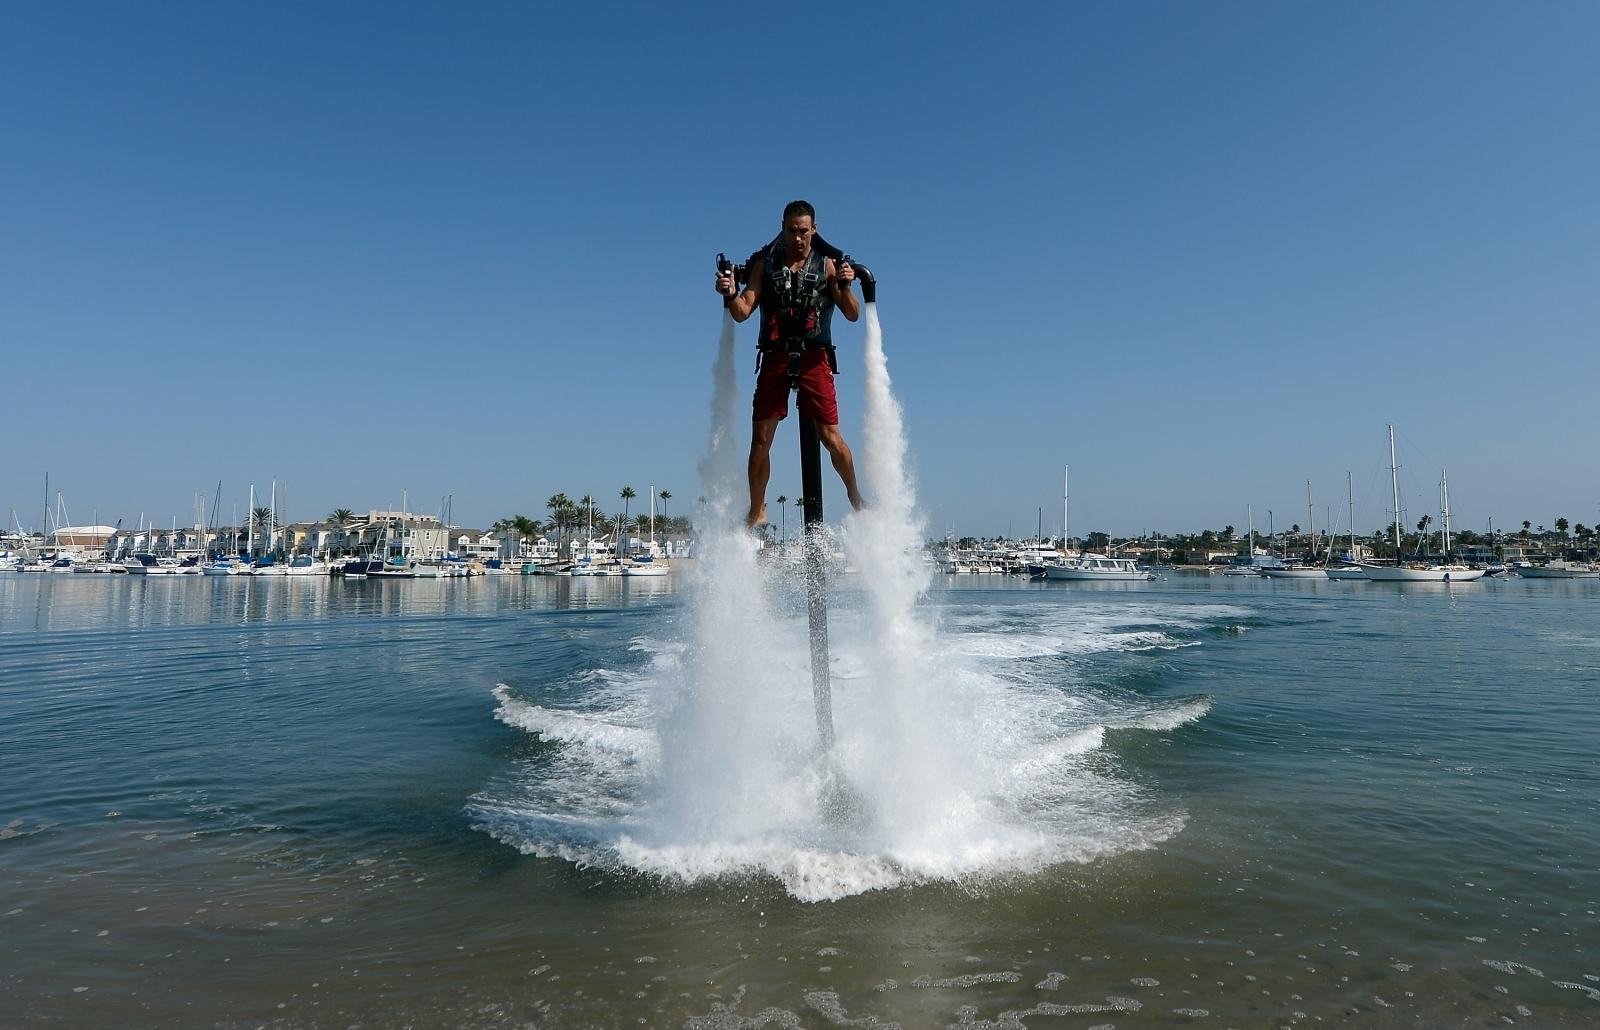 water powered jetpack